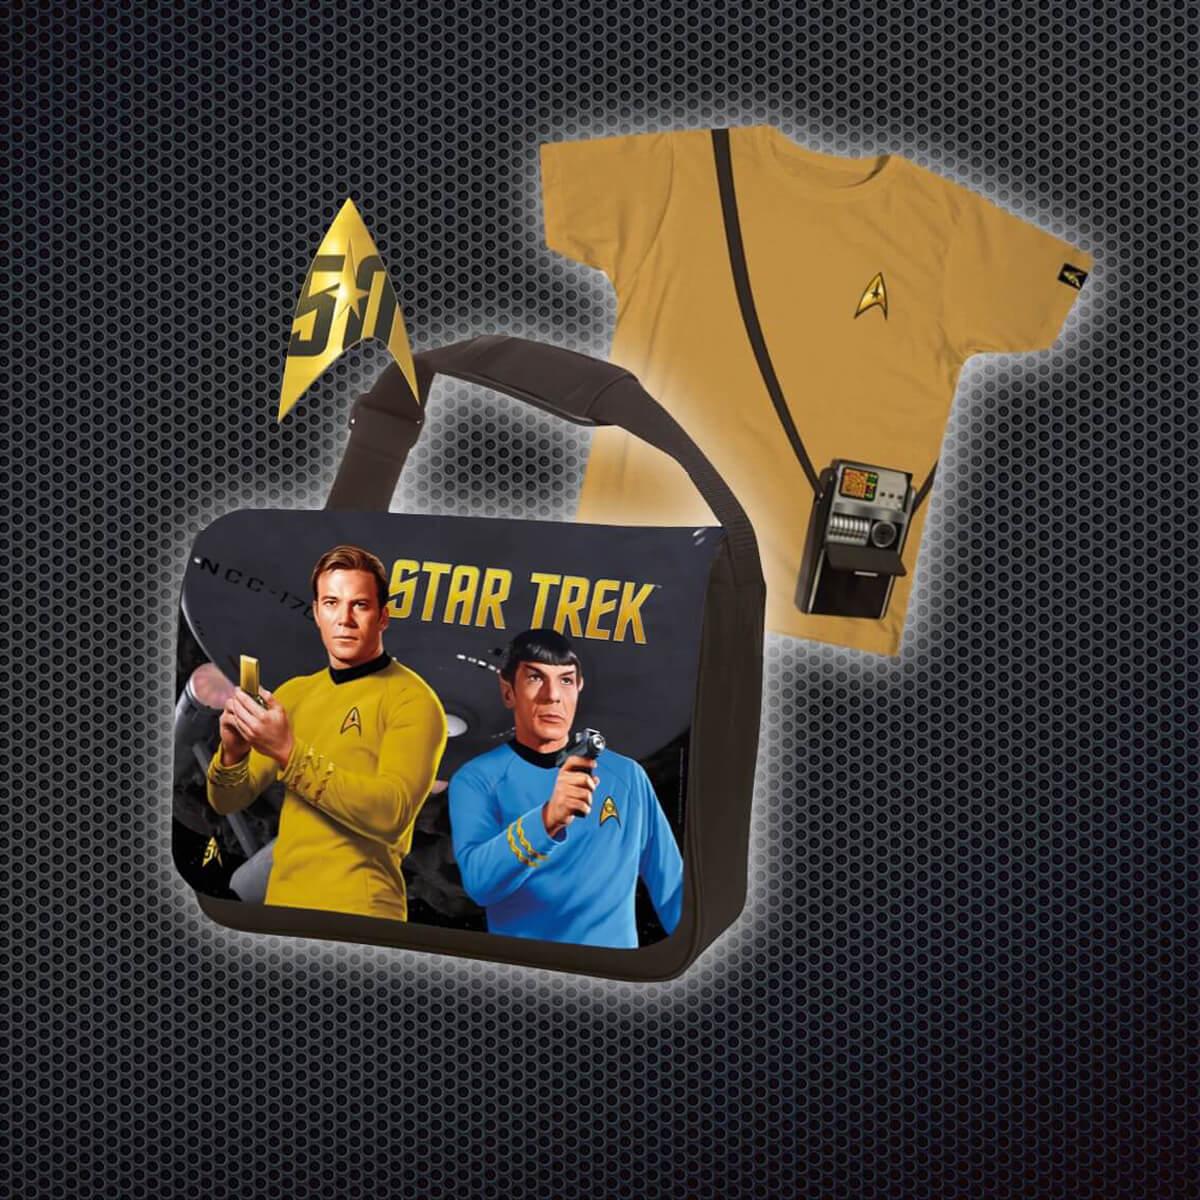 Site de rencontre special star trek